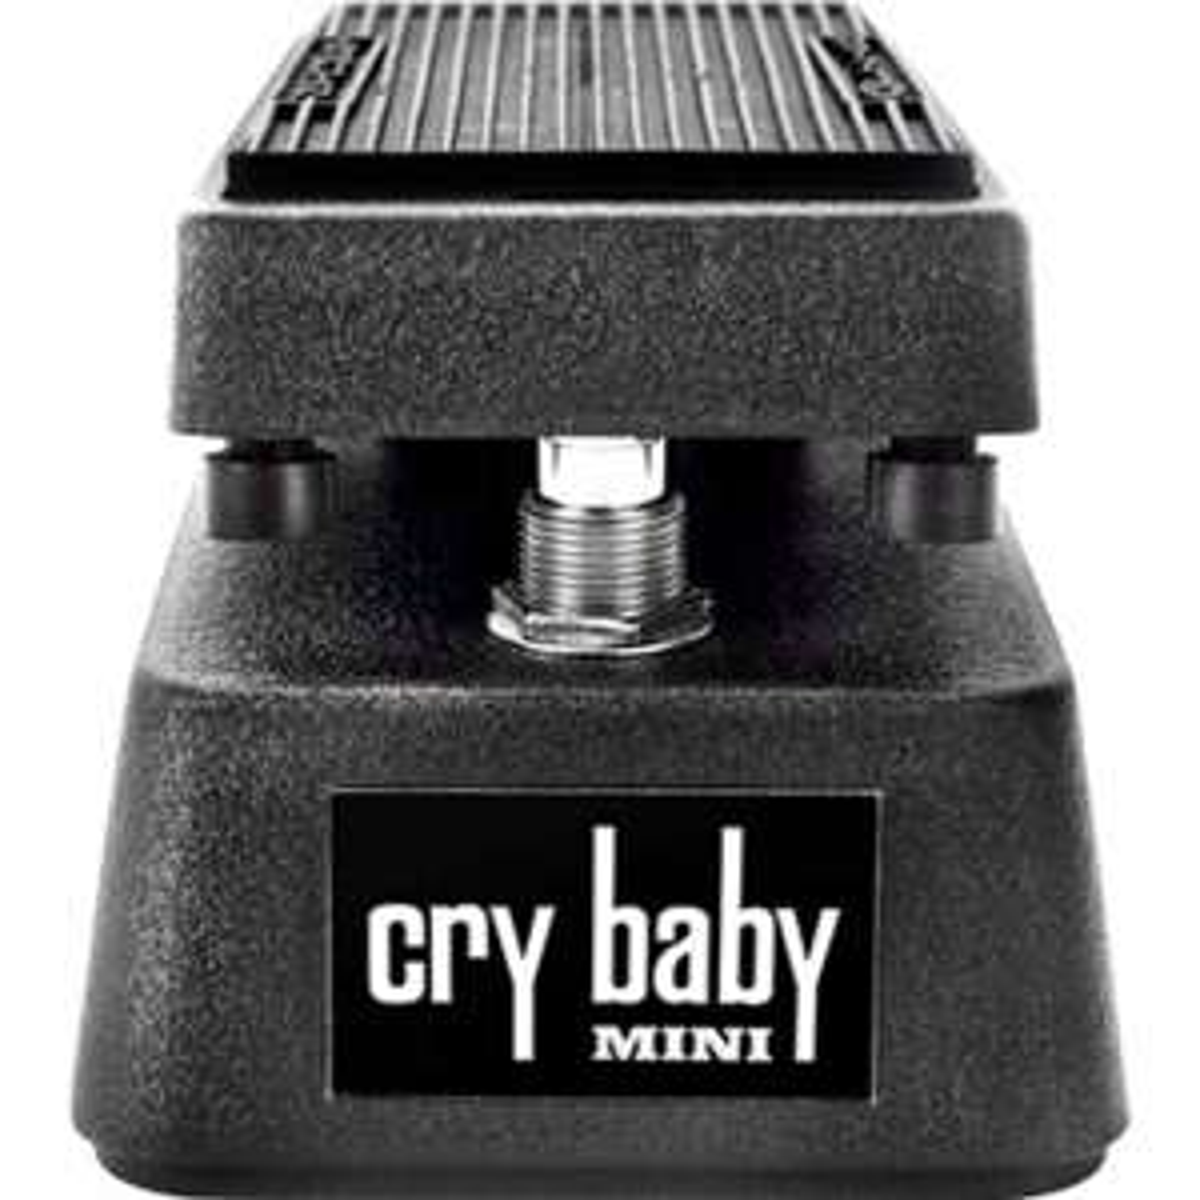 Jim Dunlop Crybaby Mini Wah Pedal - £89 @ Dawsons Music